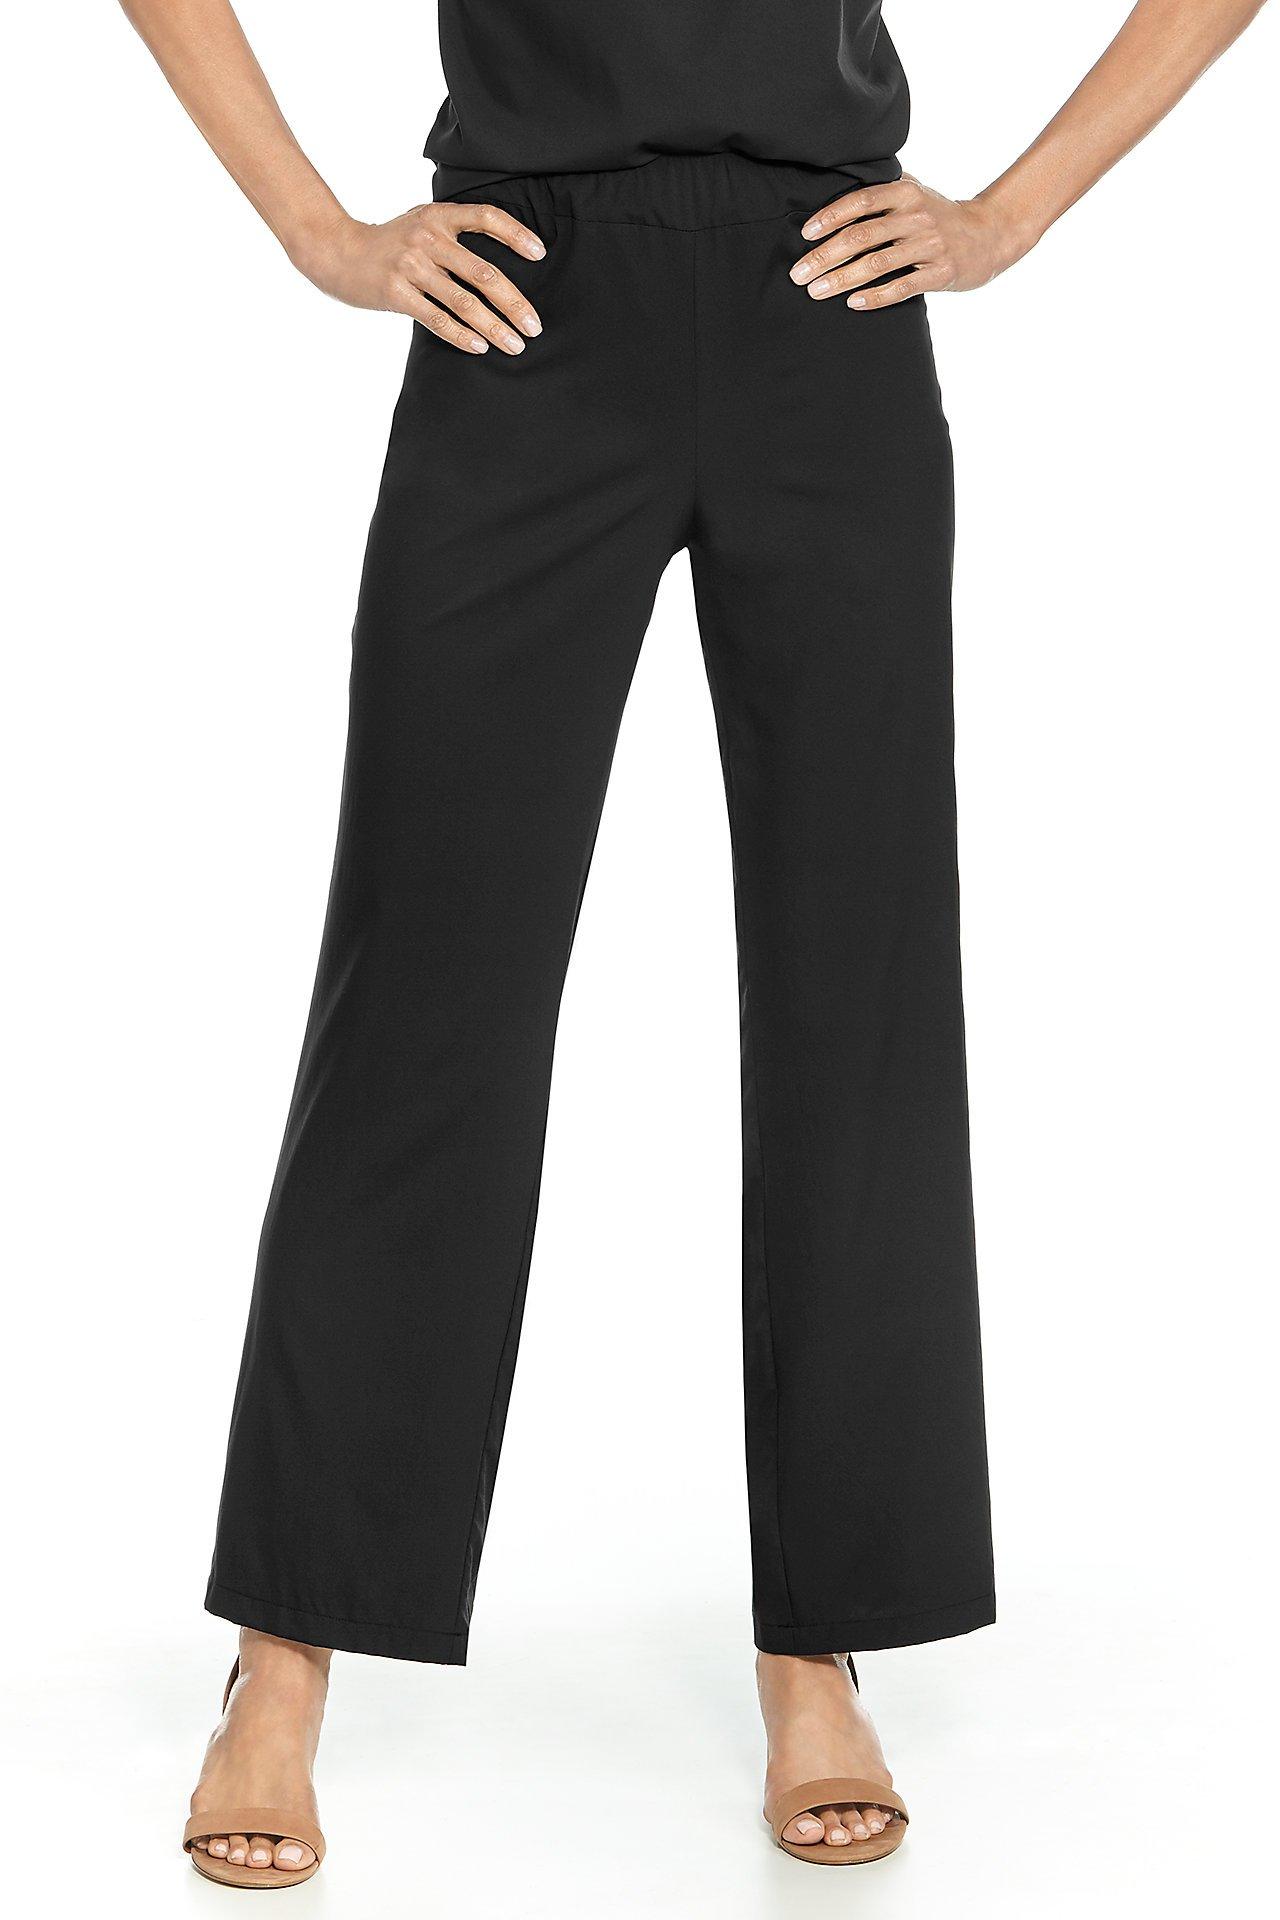 Coolibar UPF 50+ Women's Verona Straight Leg Pant - Sun Protective (Small- Black)